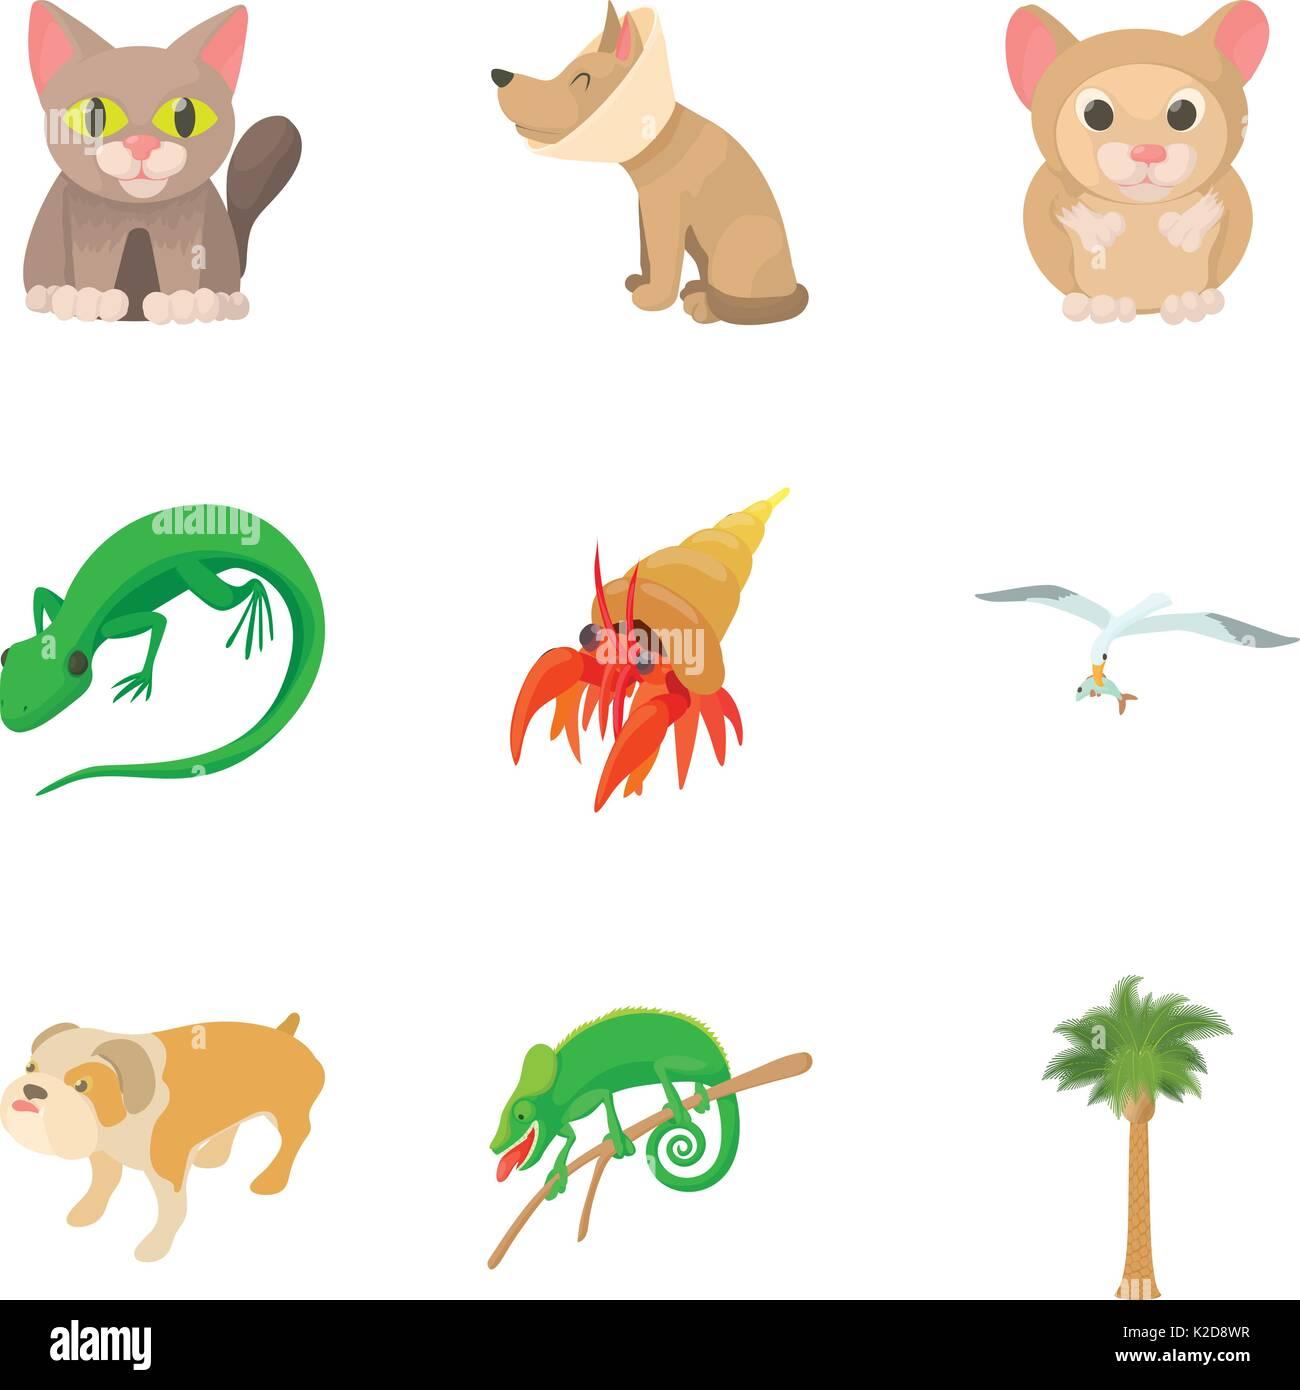 Small animal icons set, cartoon style - Stock Image